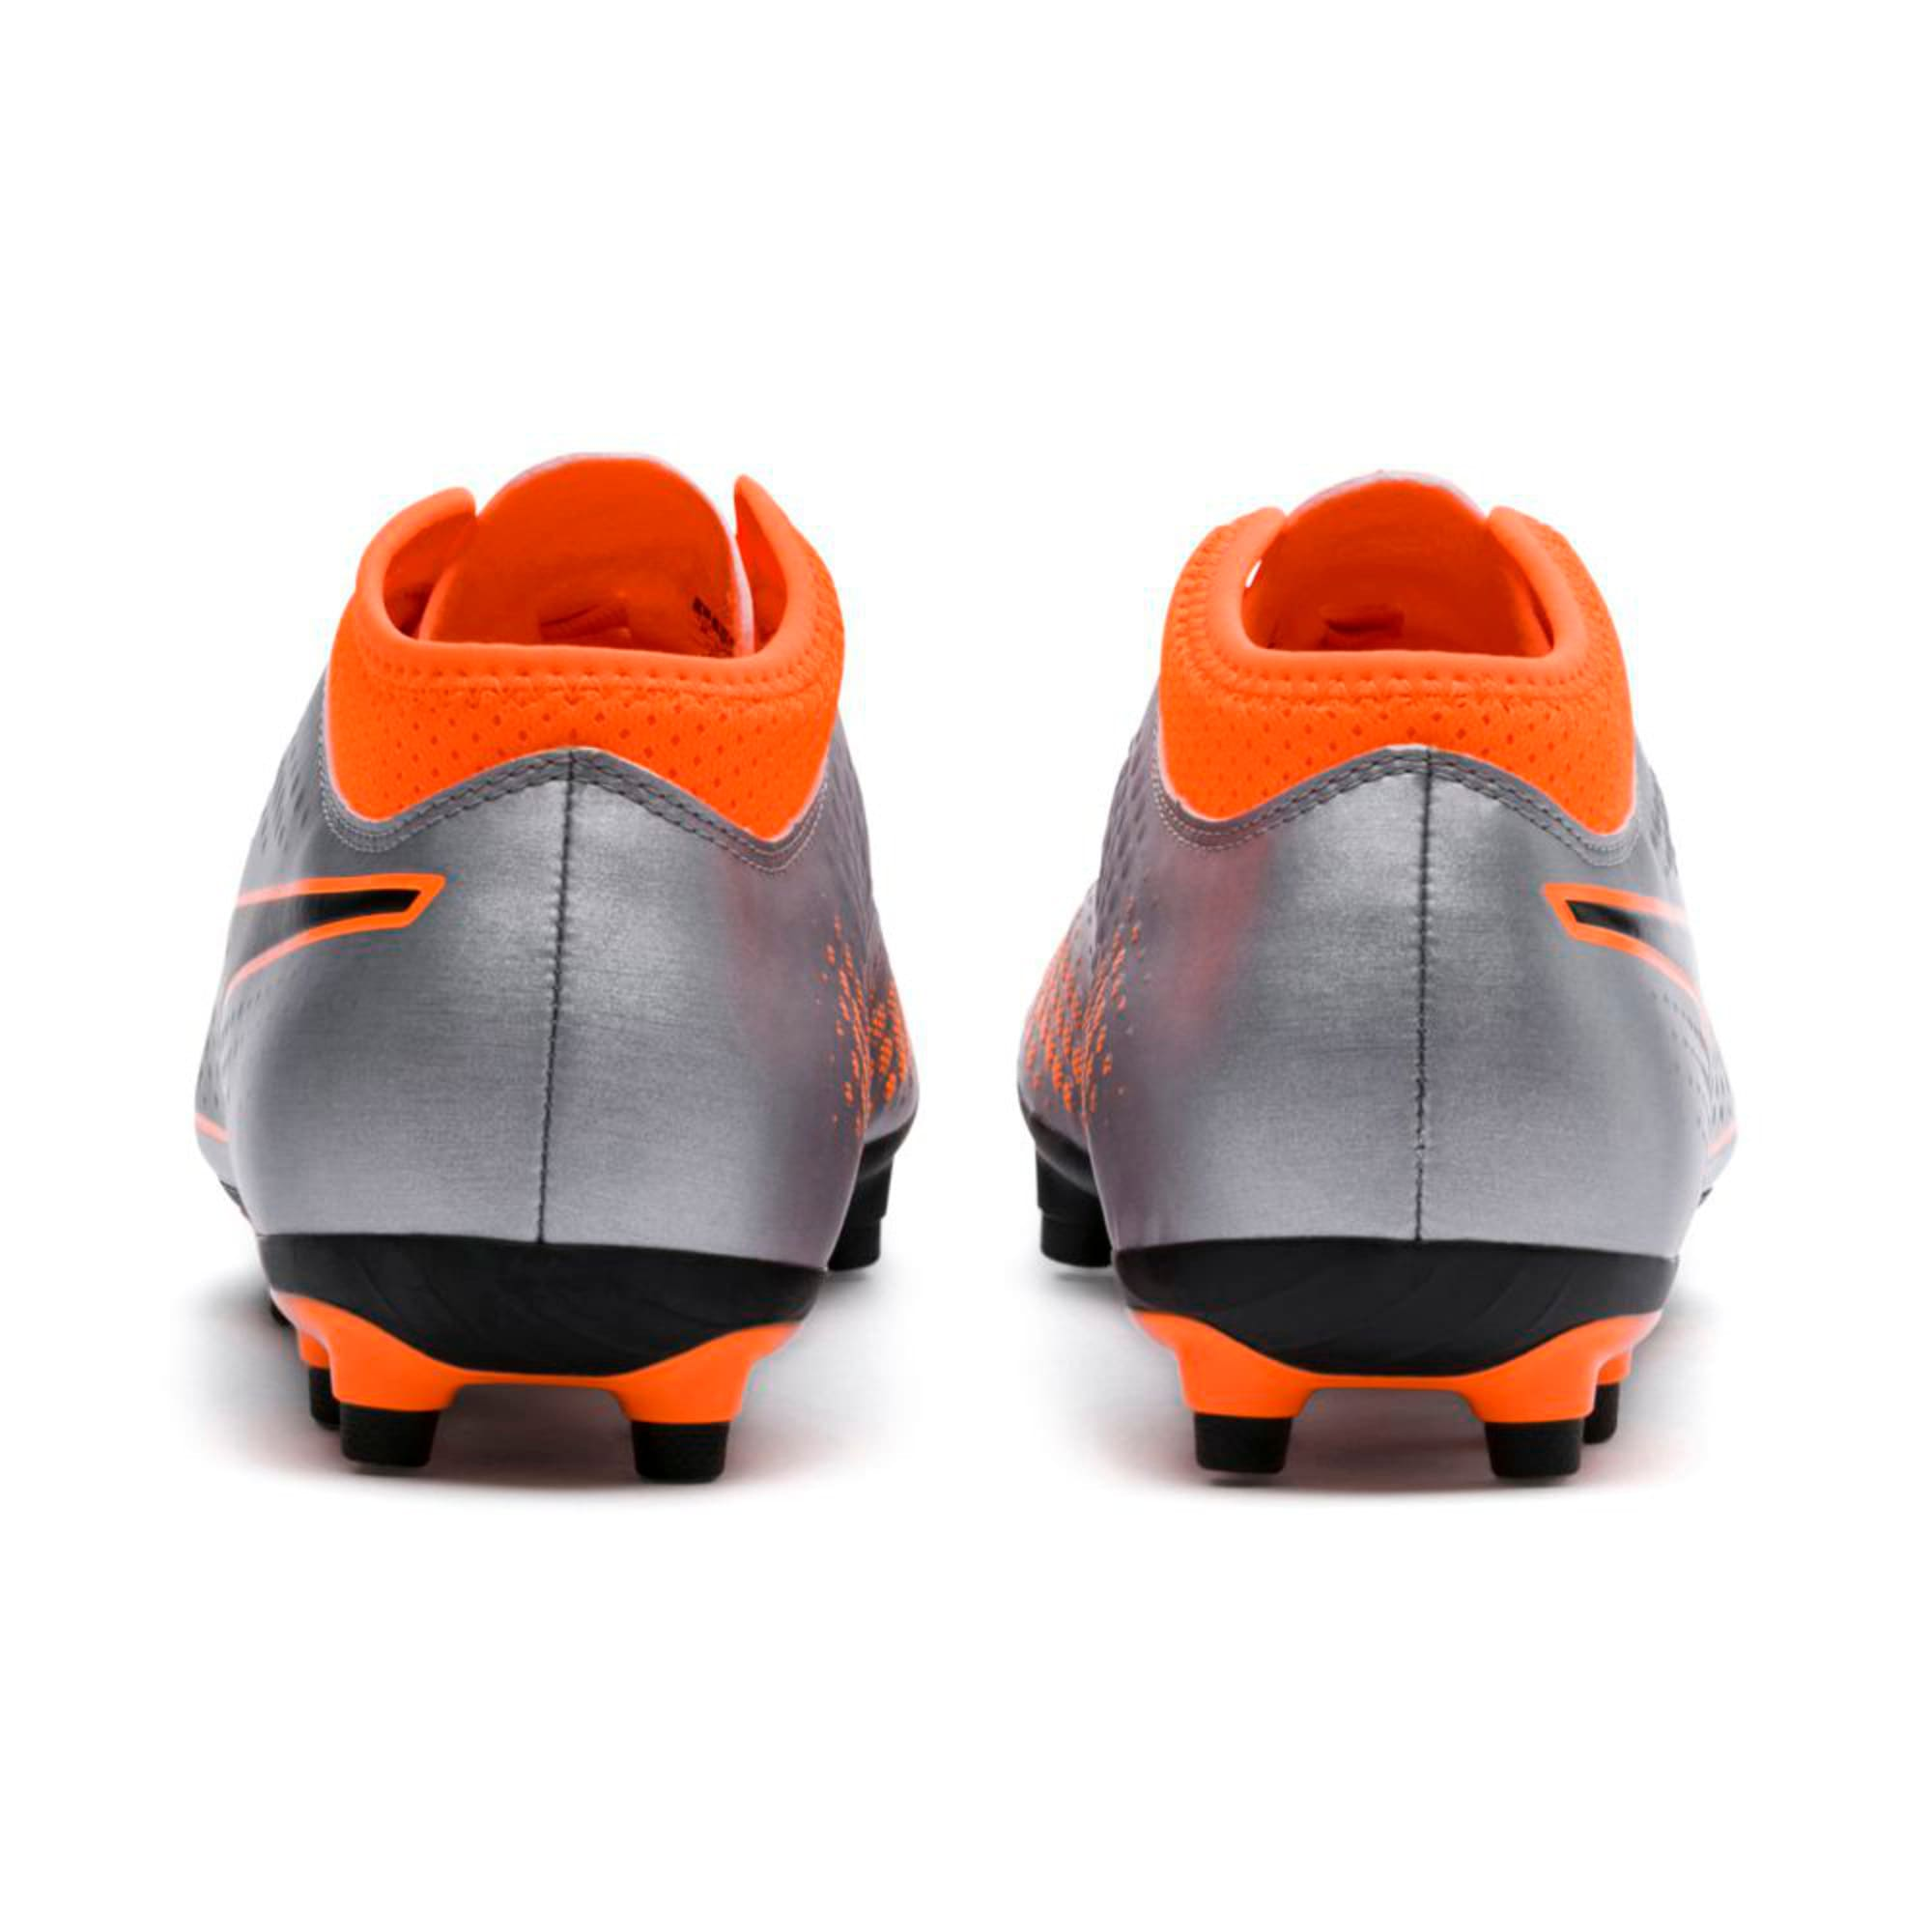 Thumbnail 4 of PUMA ONE 4 Synthetic FG Men's Football Boots, Silver-Orange-Black, medium-IND